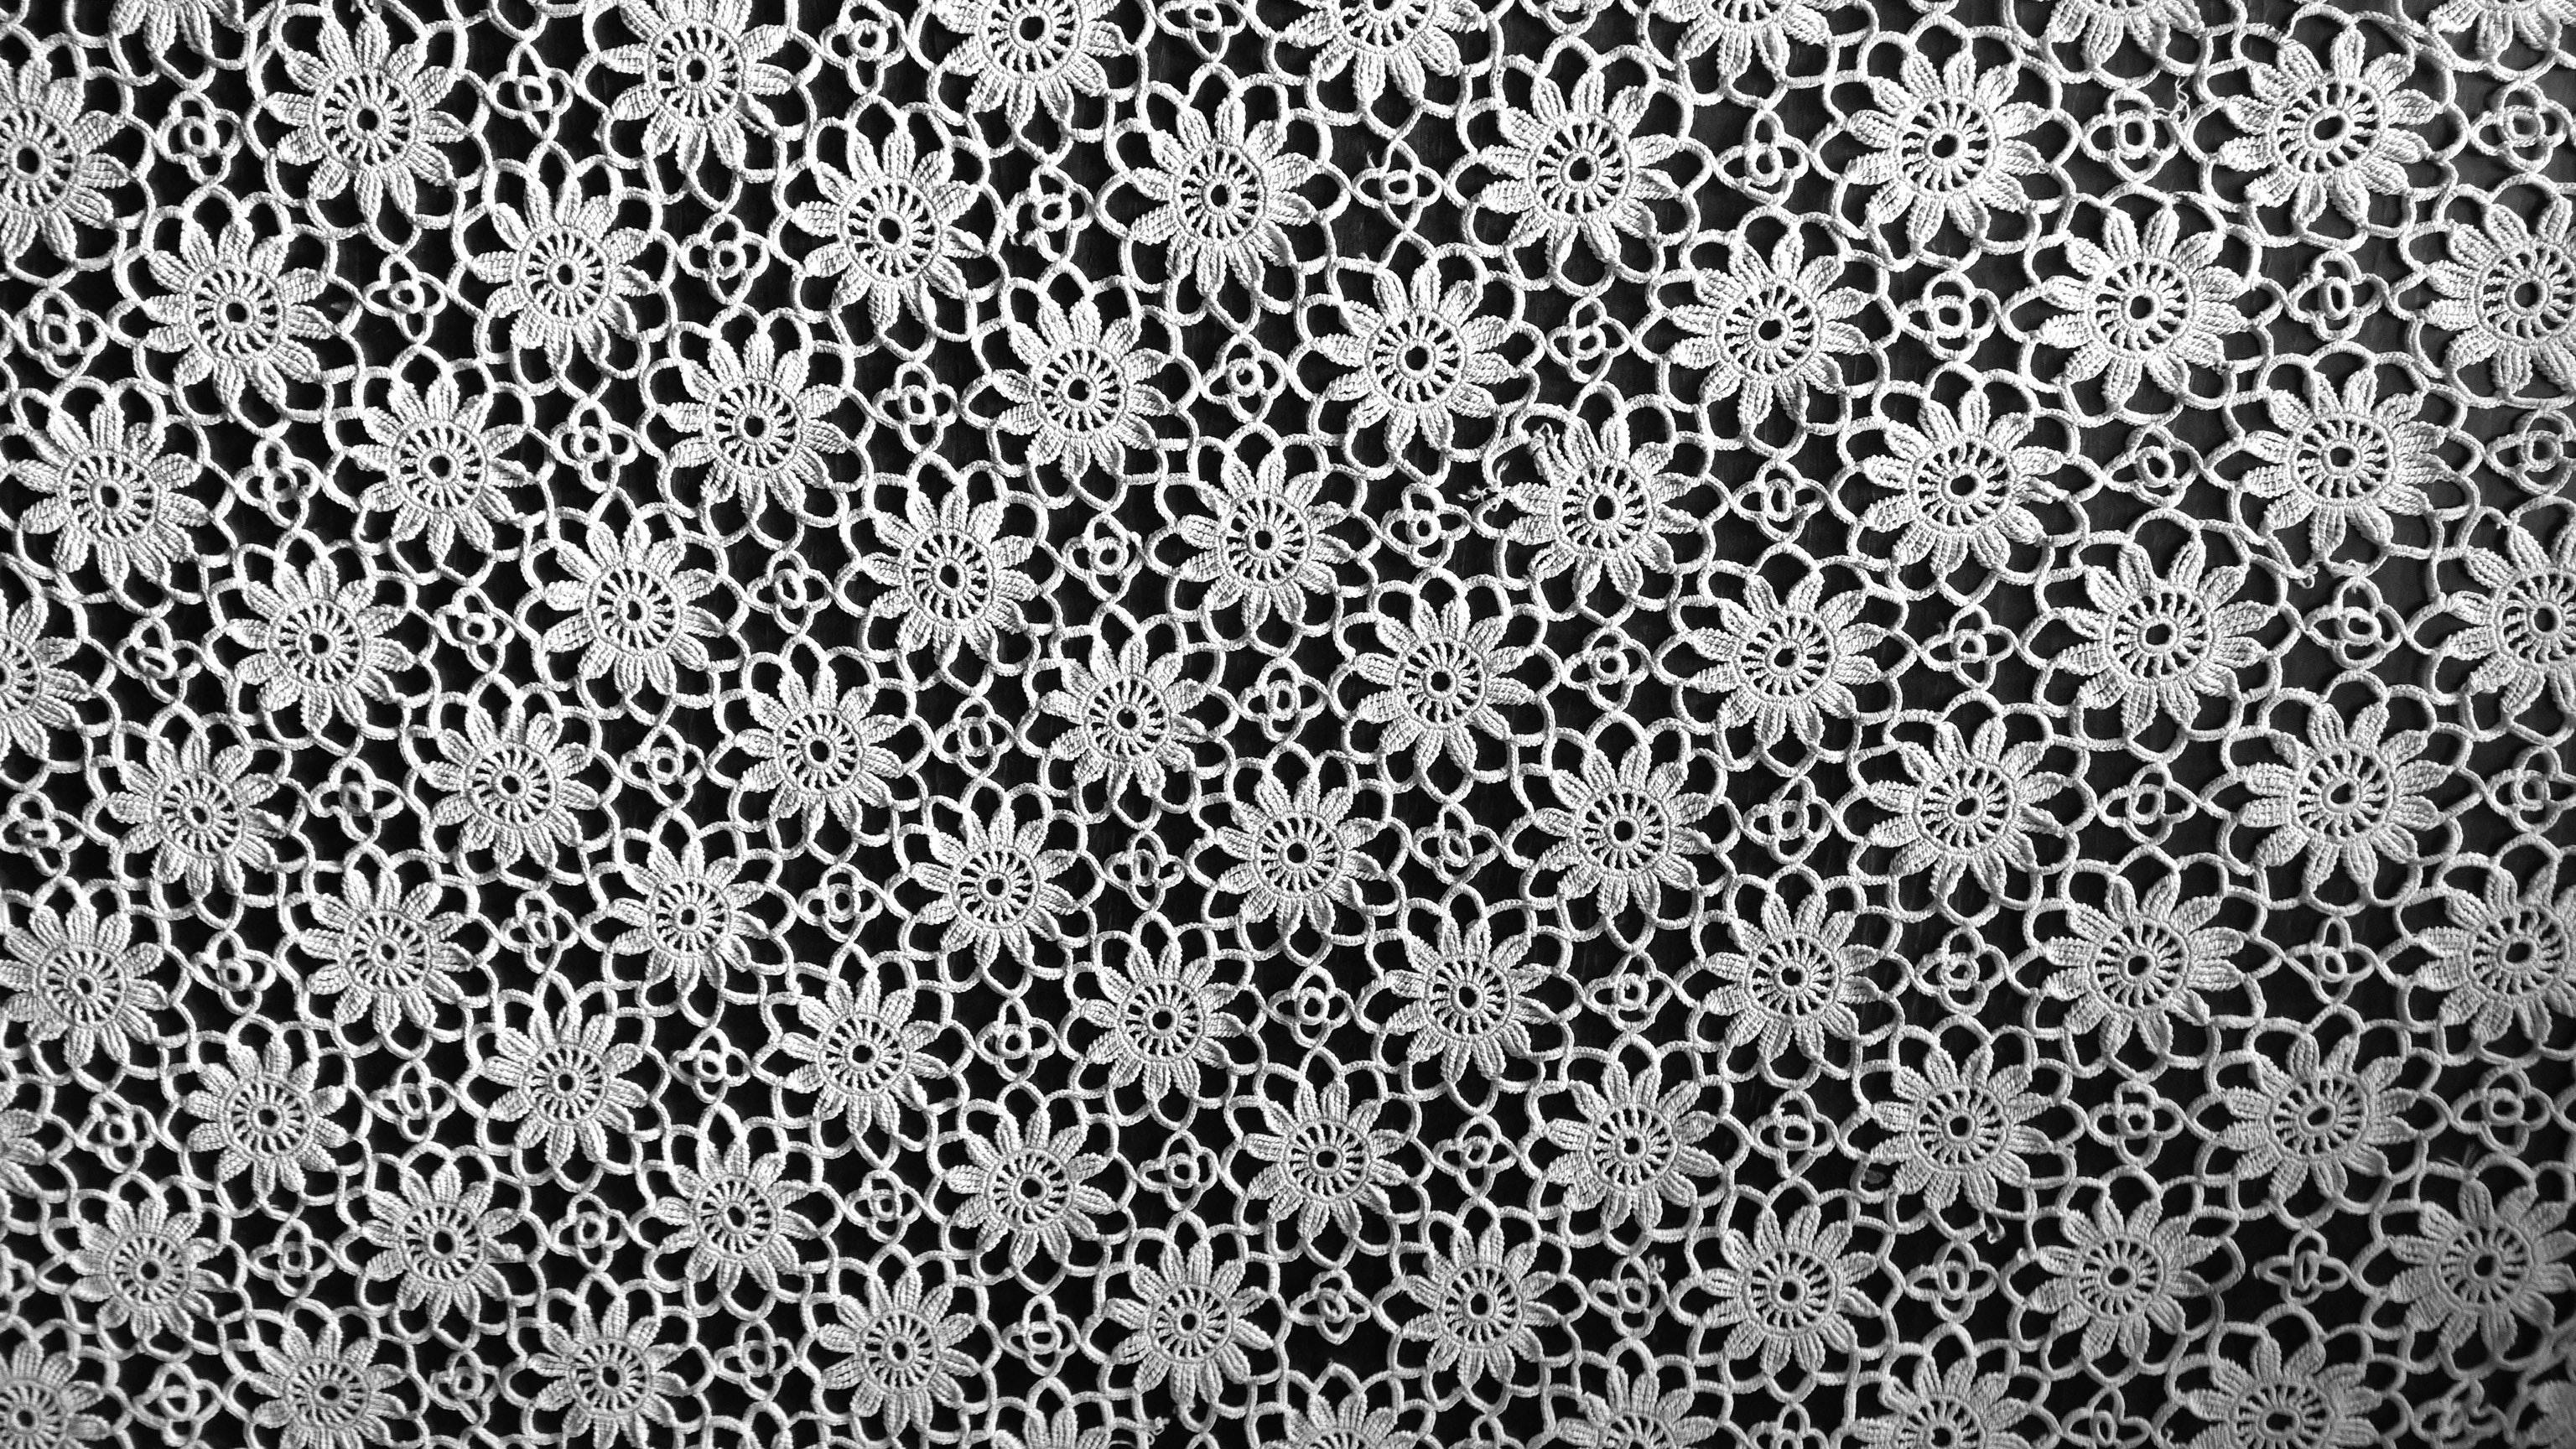 Free Stock Photo Of Blackandwhite Flower Lace